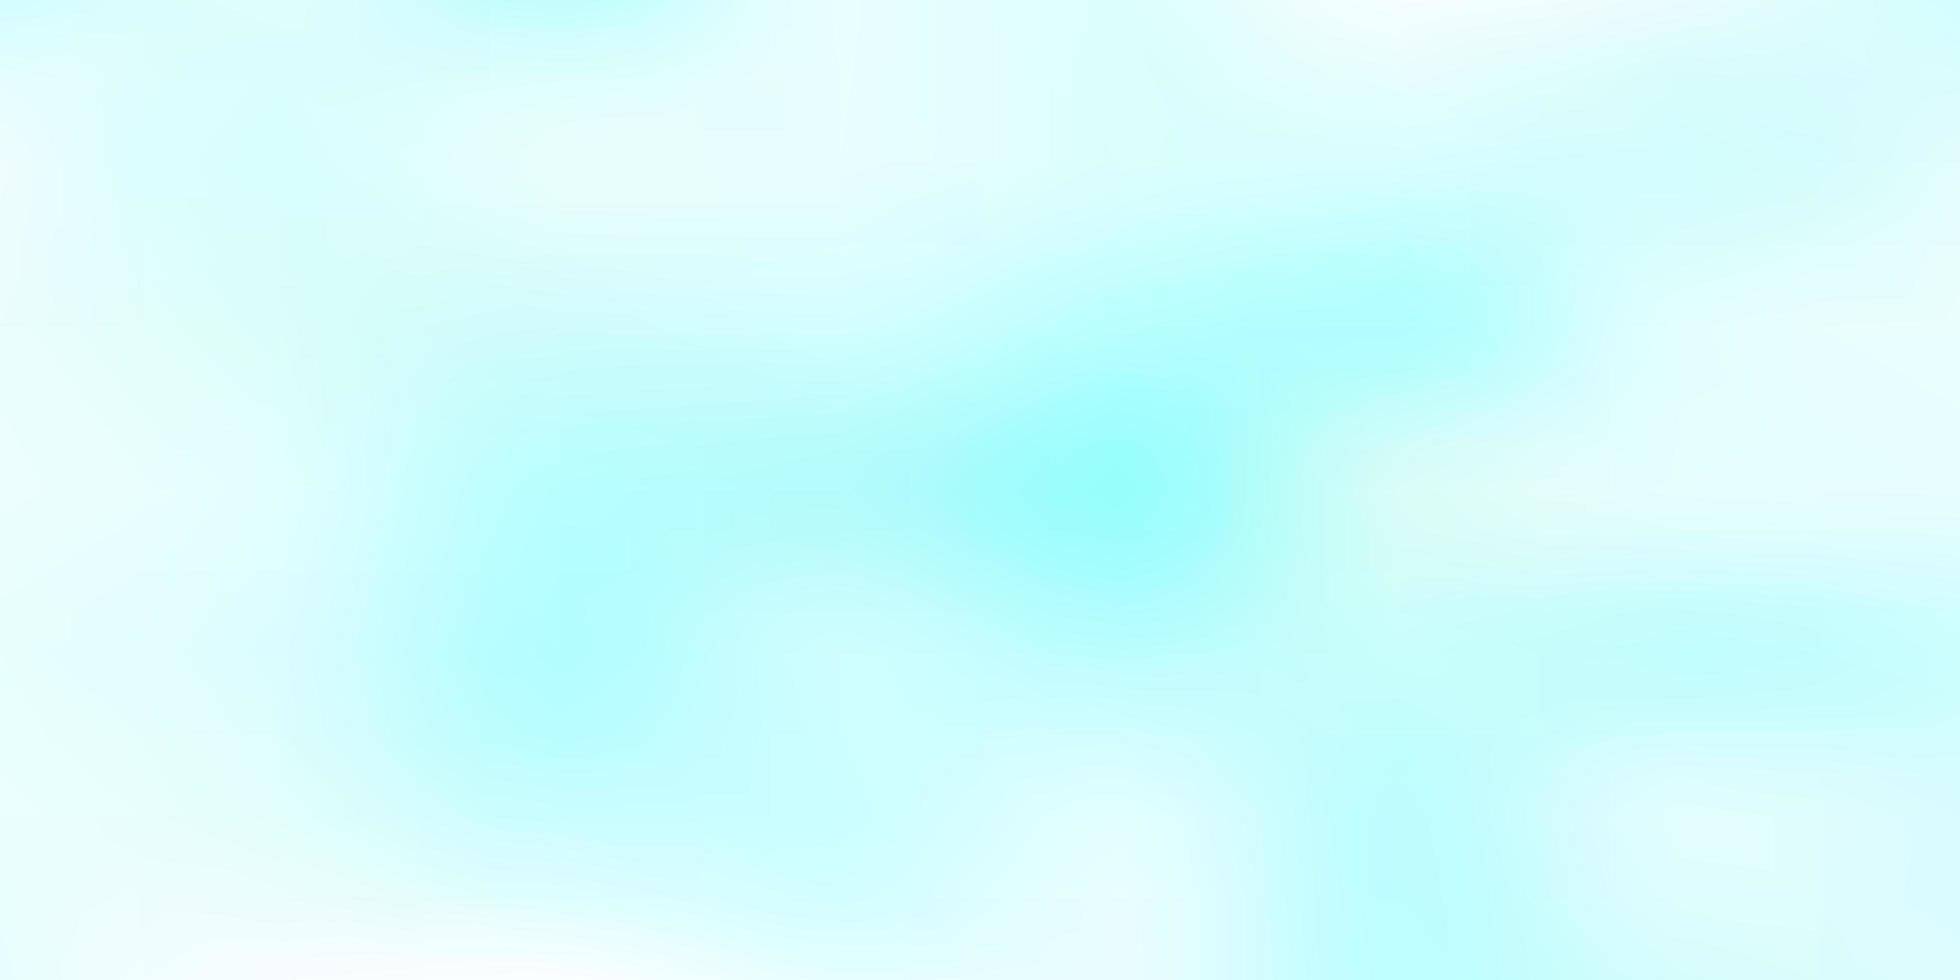 layout turva do vetor azul claro.